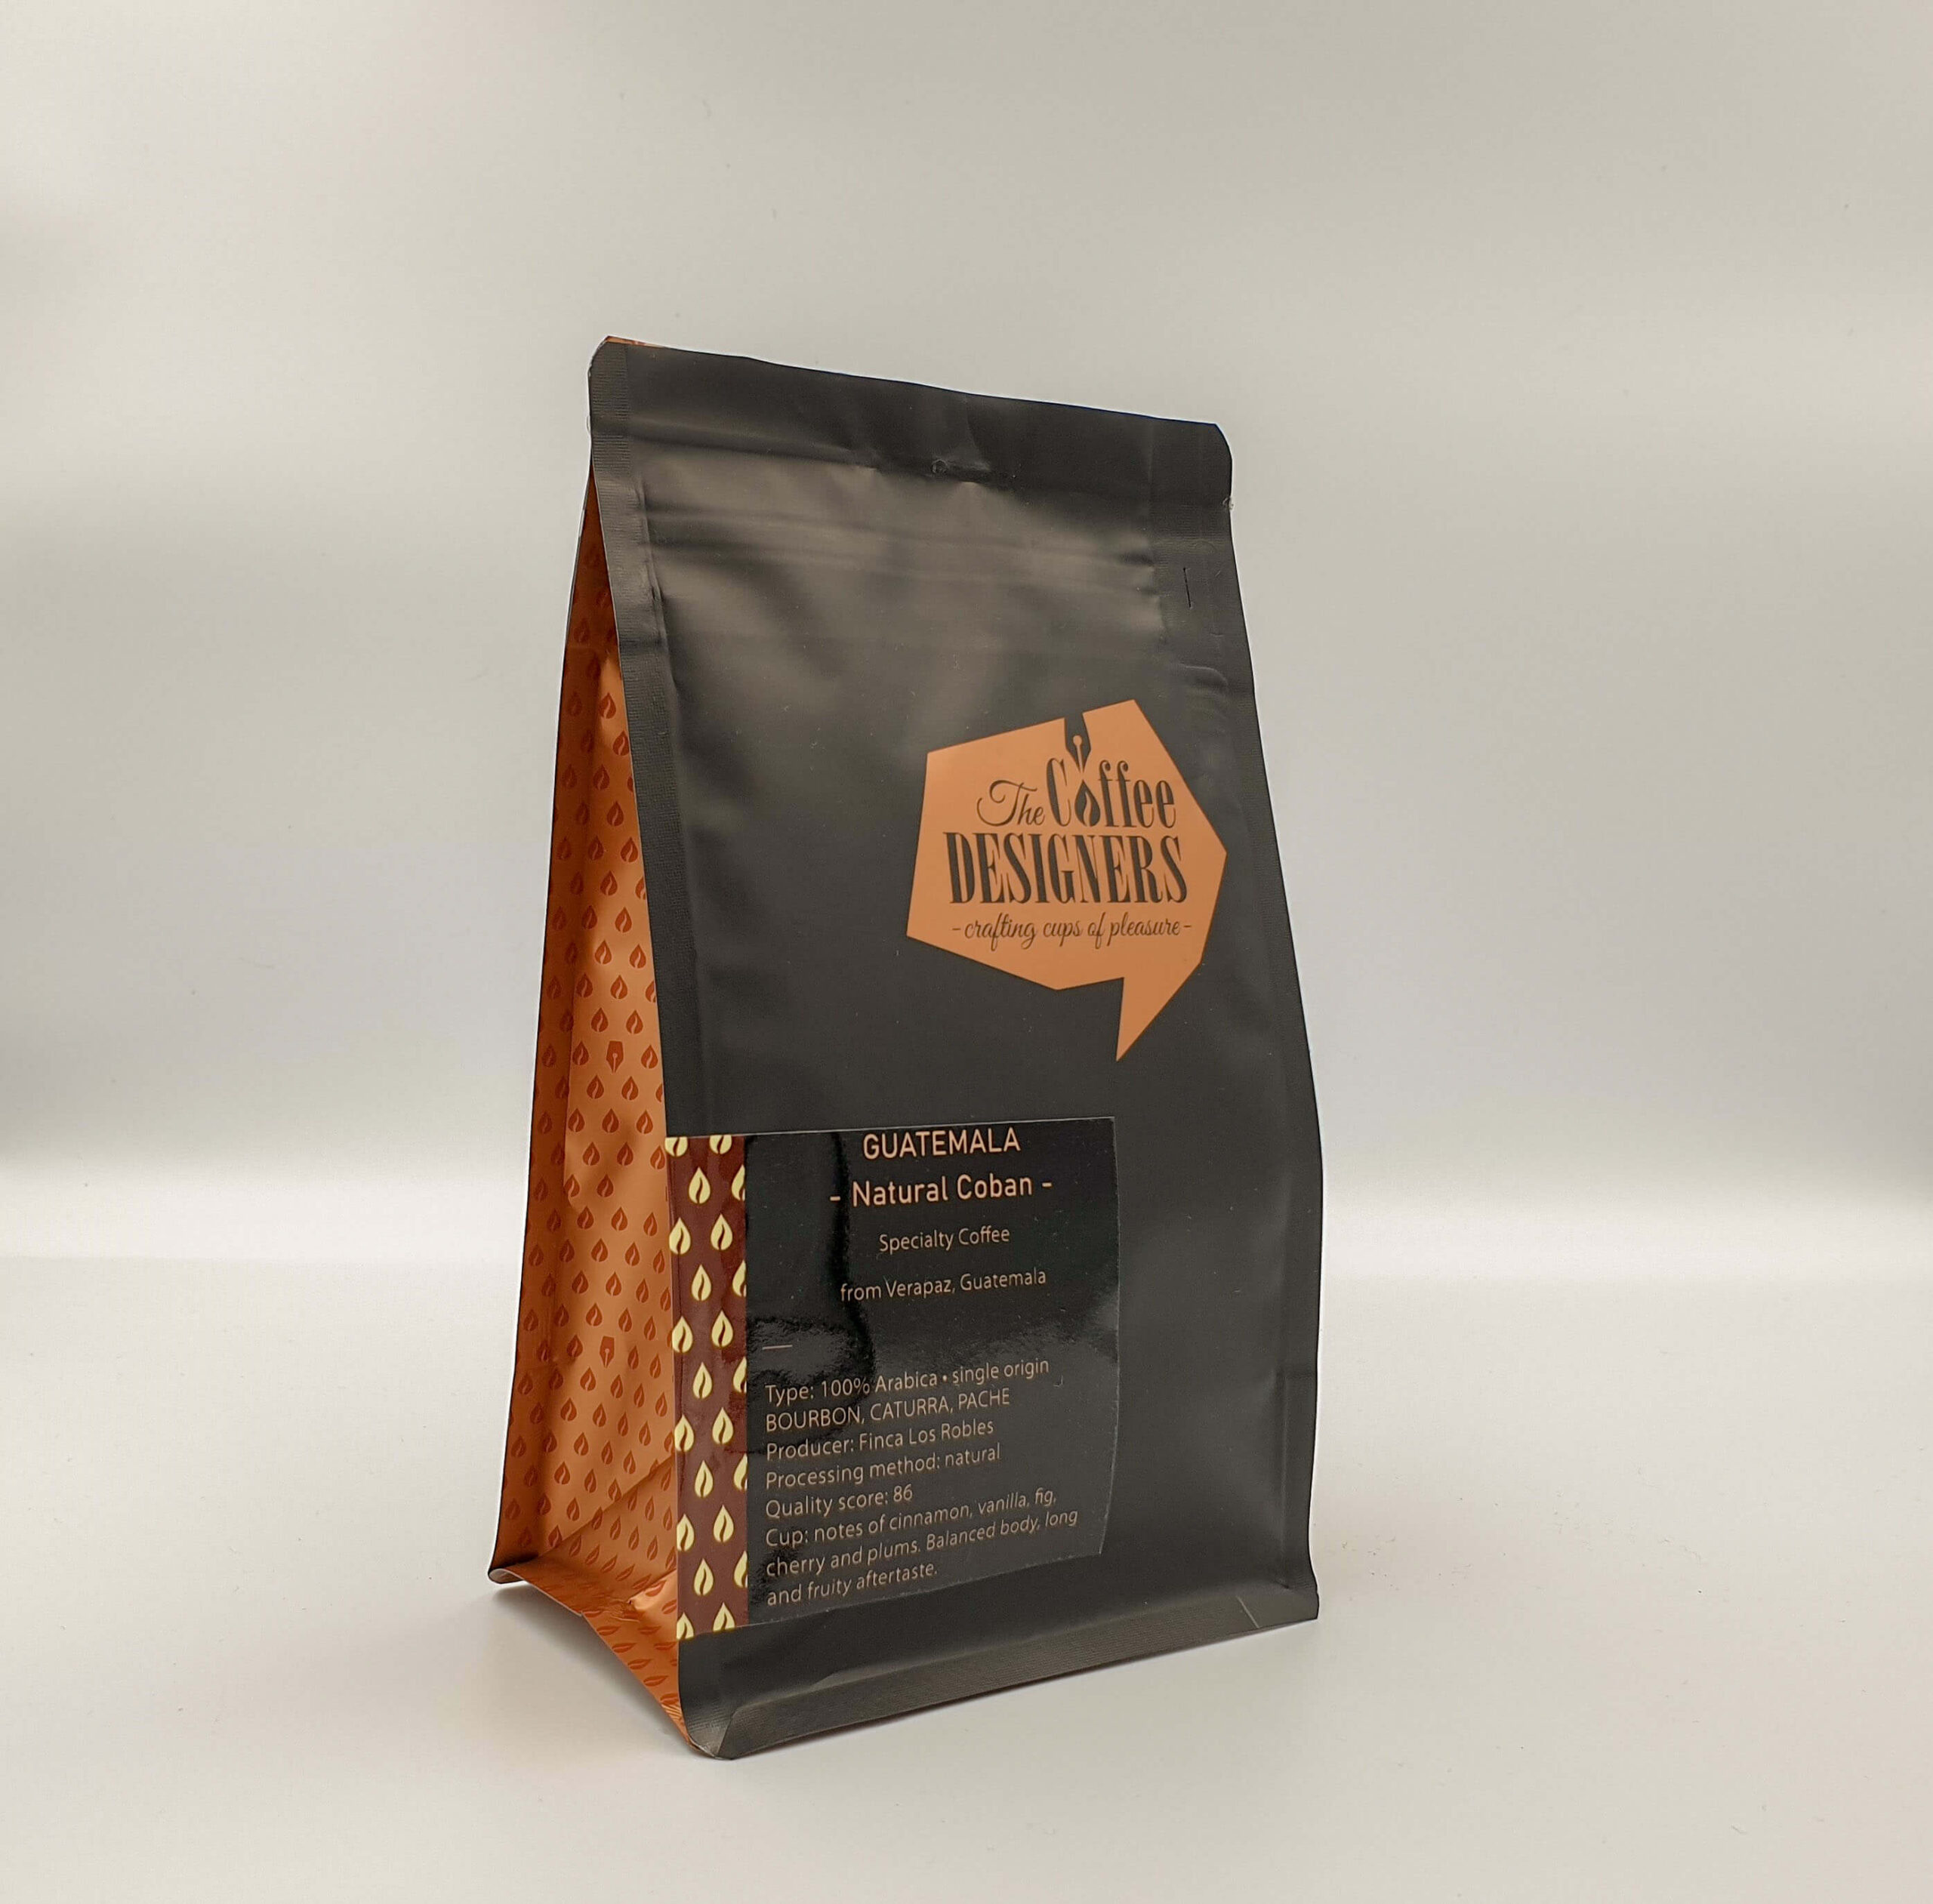 Cafea-de-specialitate_Guatemala-Natural-Coban_Coffee-Designers